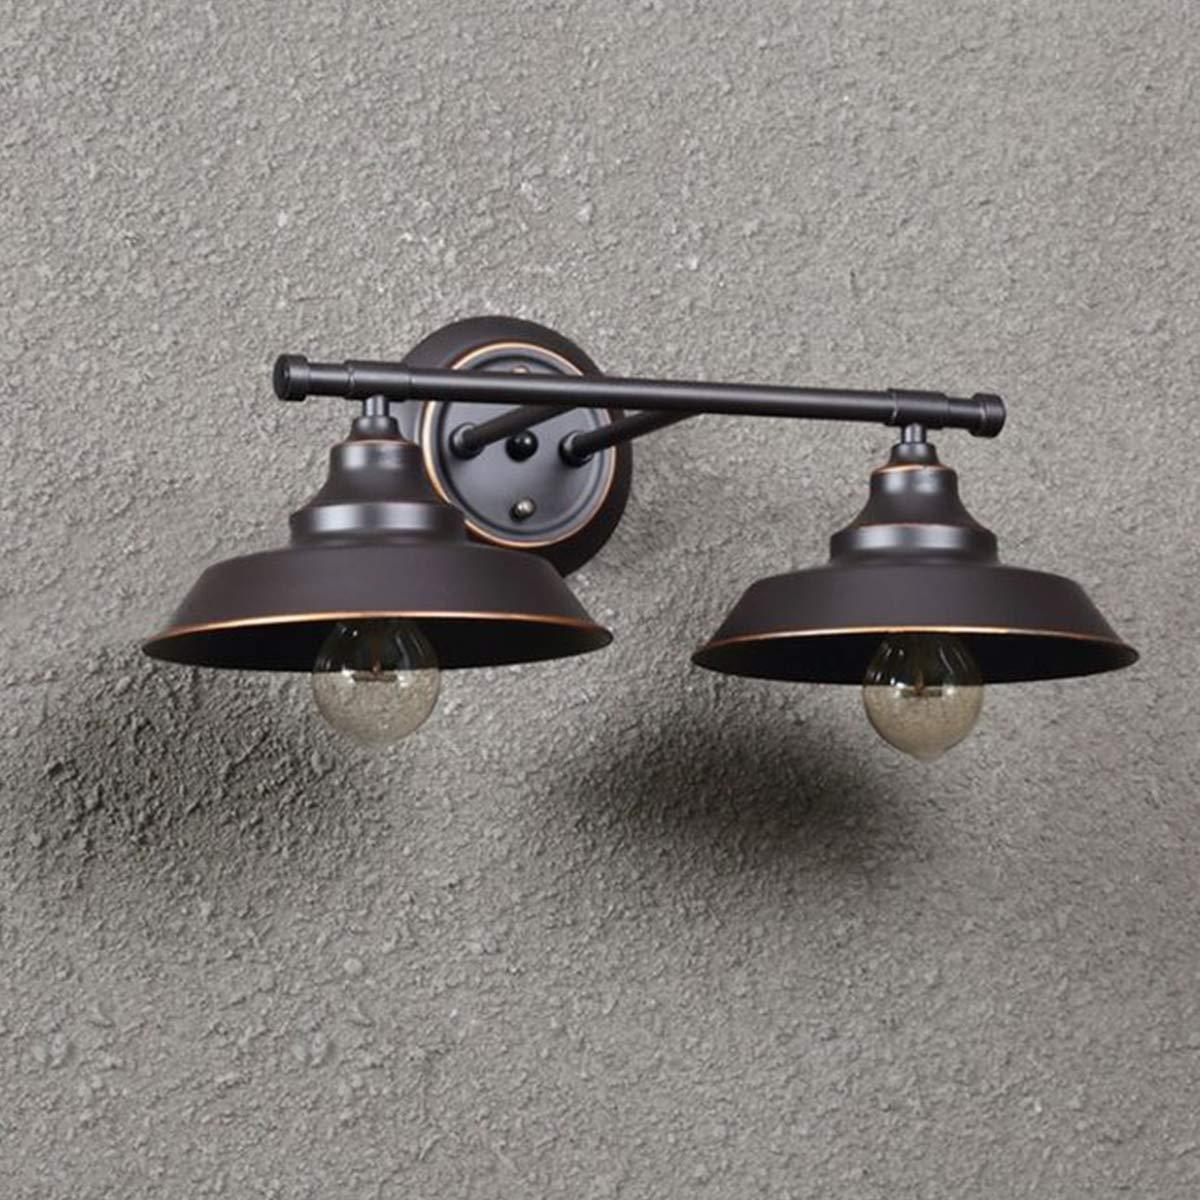 Wandlampe Vintage Wandleuchte E200 20 flammig Badezimmer Lampe ...